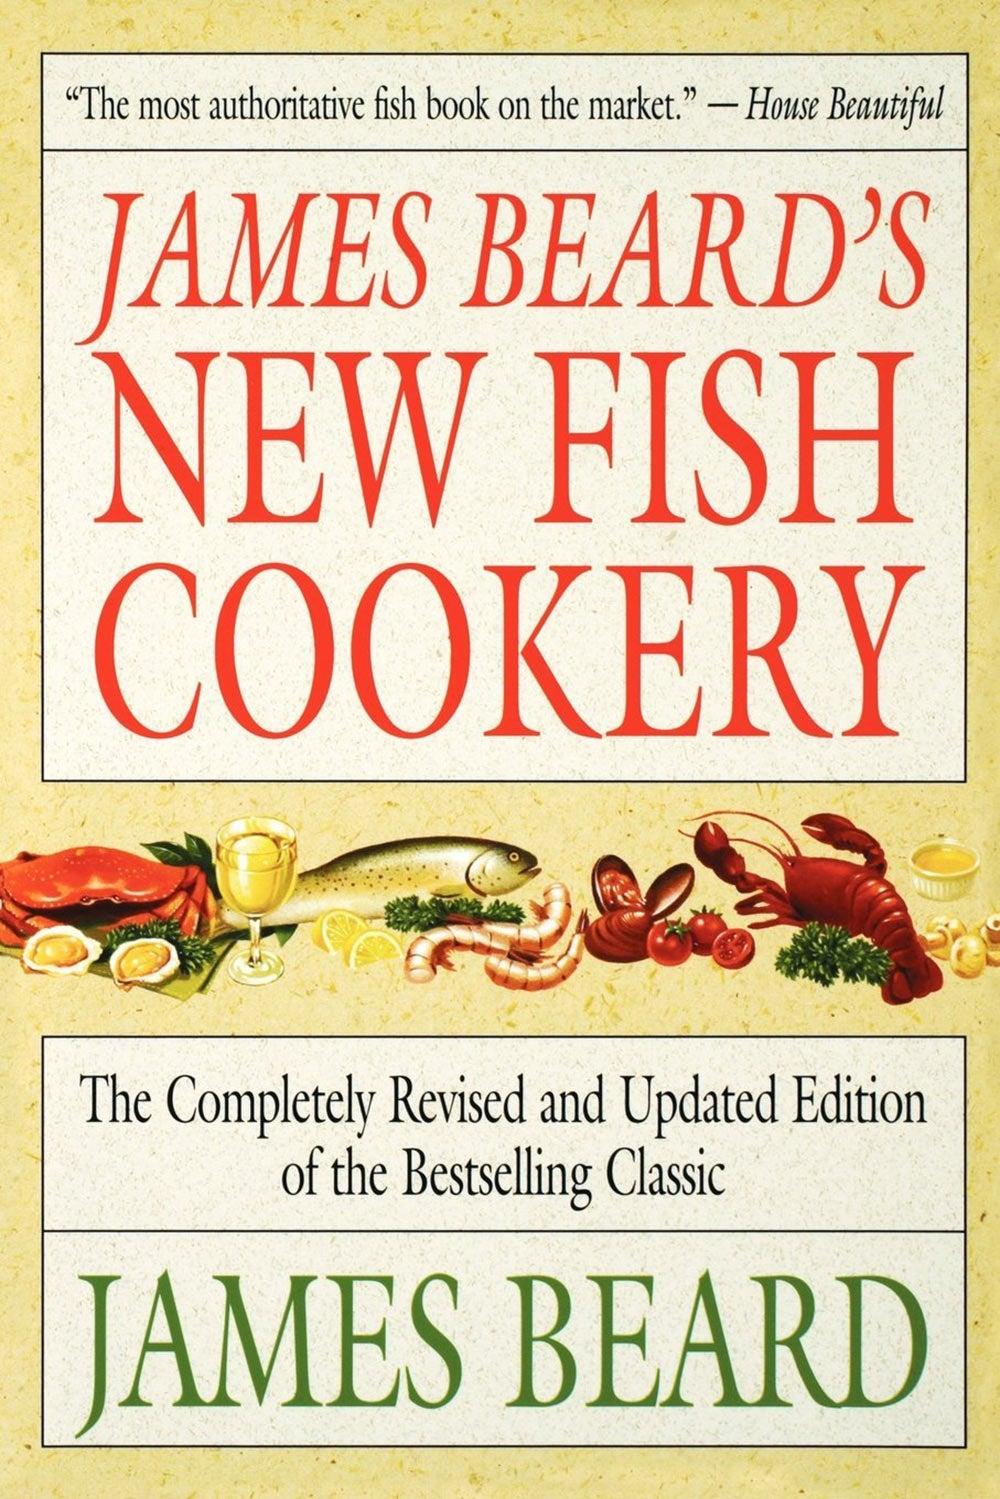 James Beard's New Fish Cookery, by James Beard